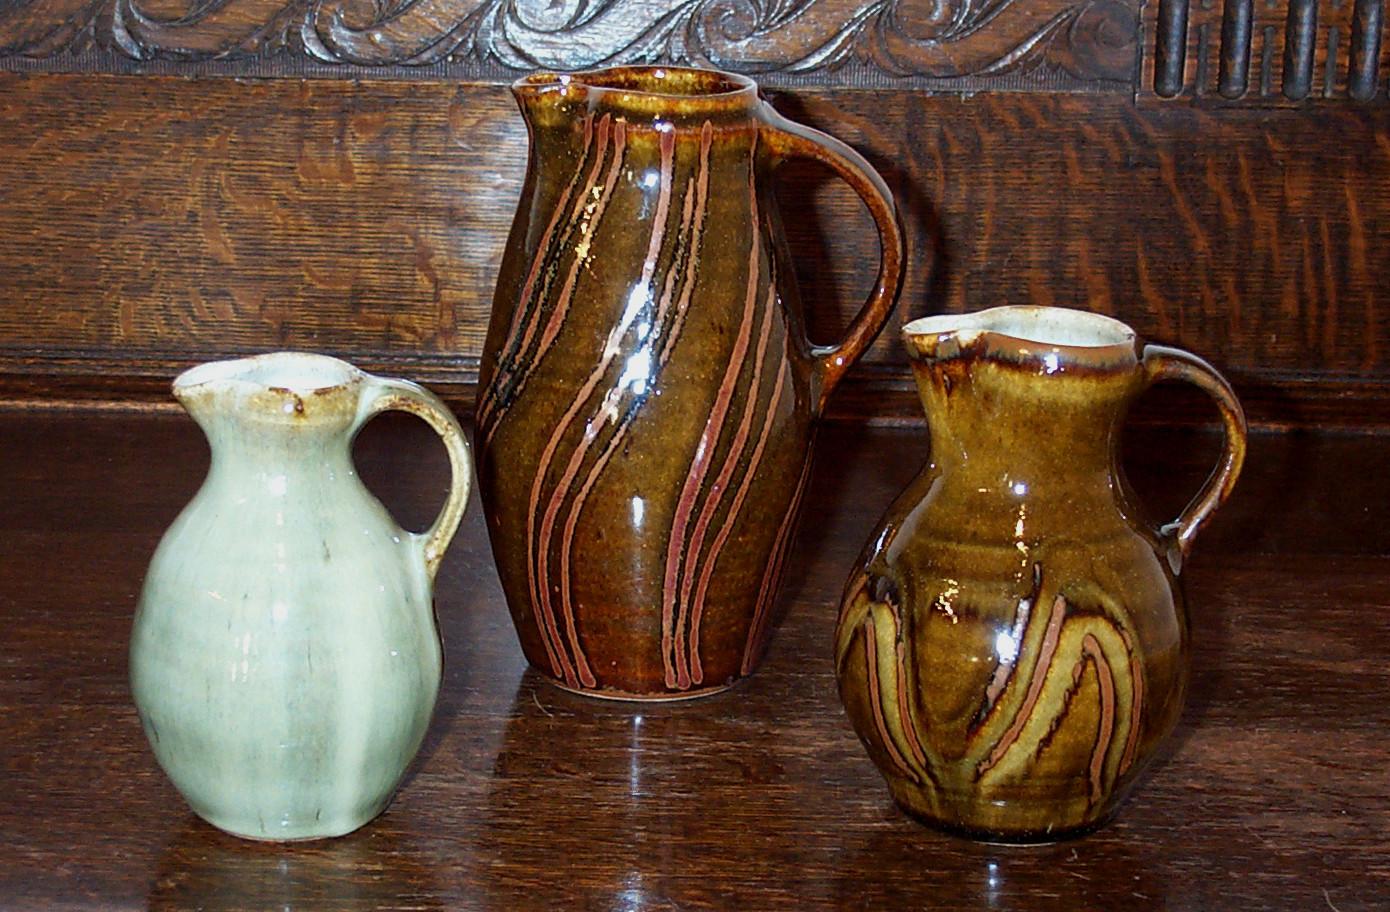 099-101 jugs.jpg